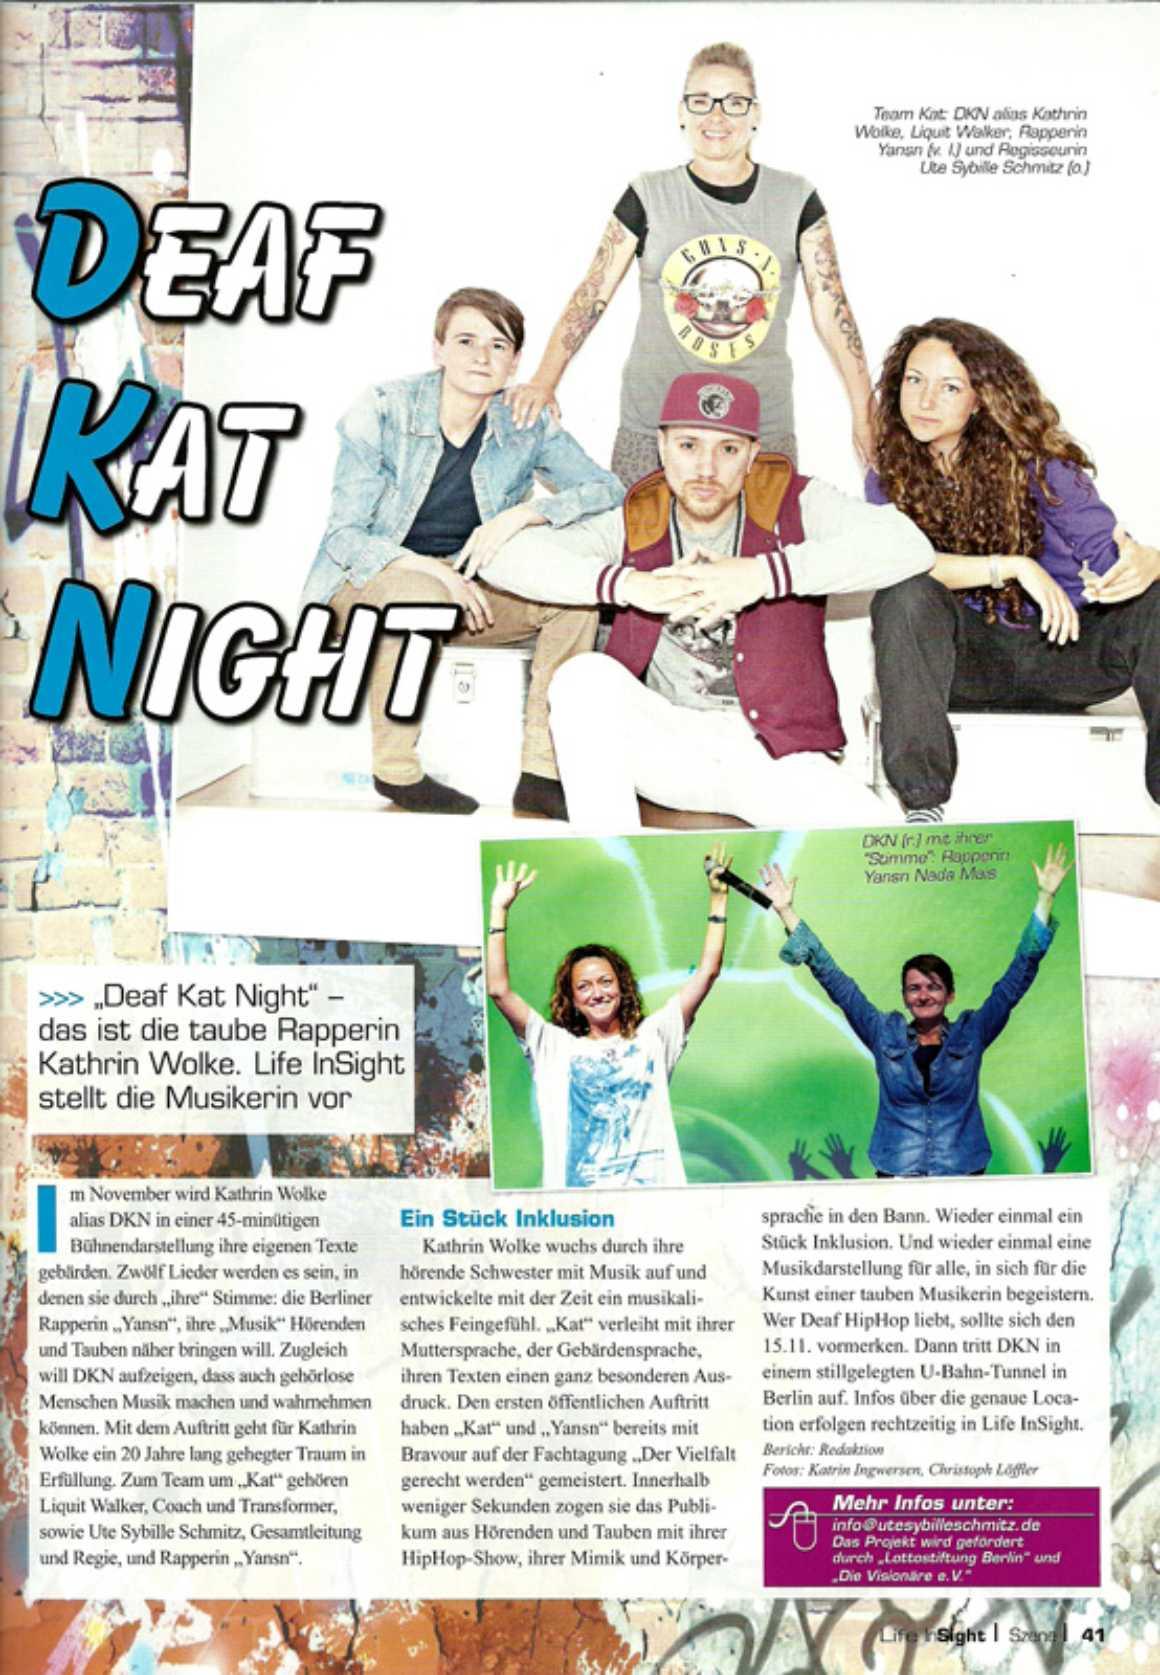 Life In Sight - Deaf Kat Night